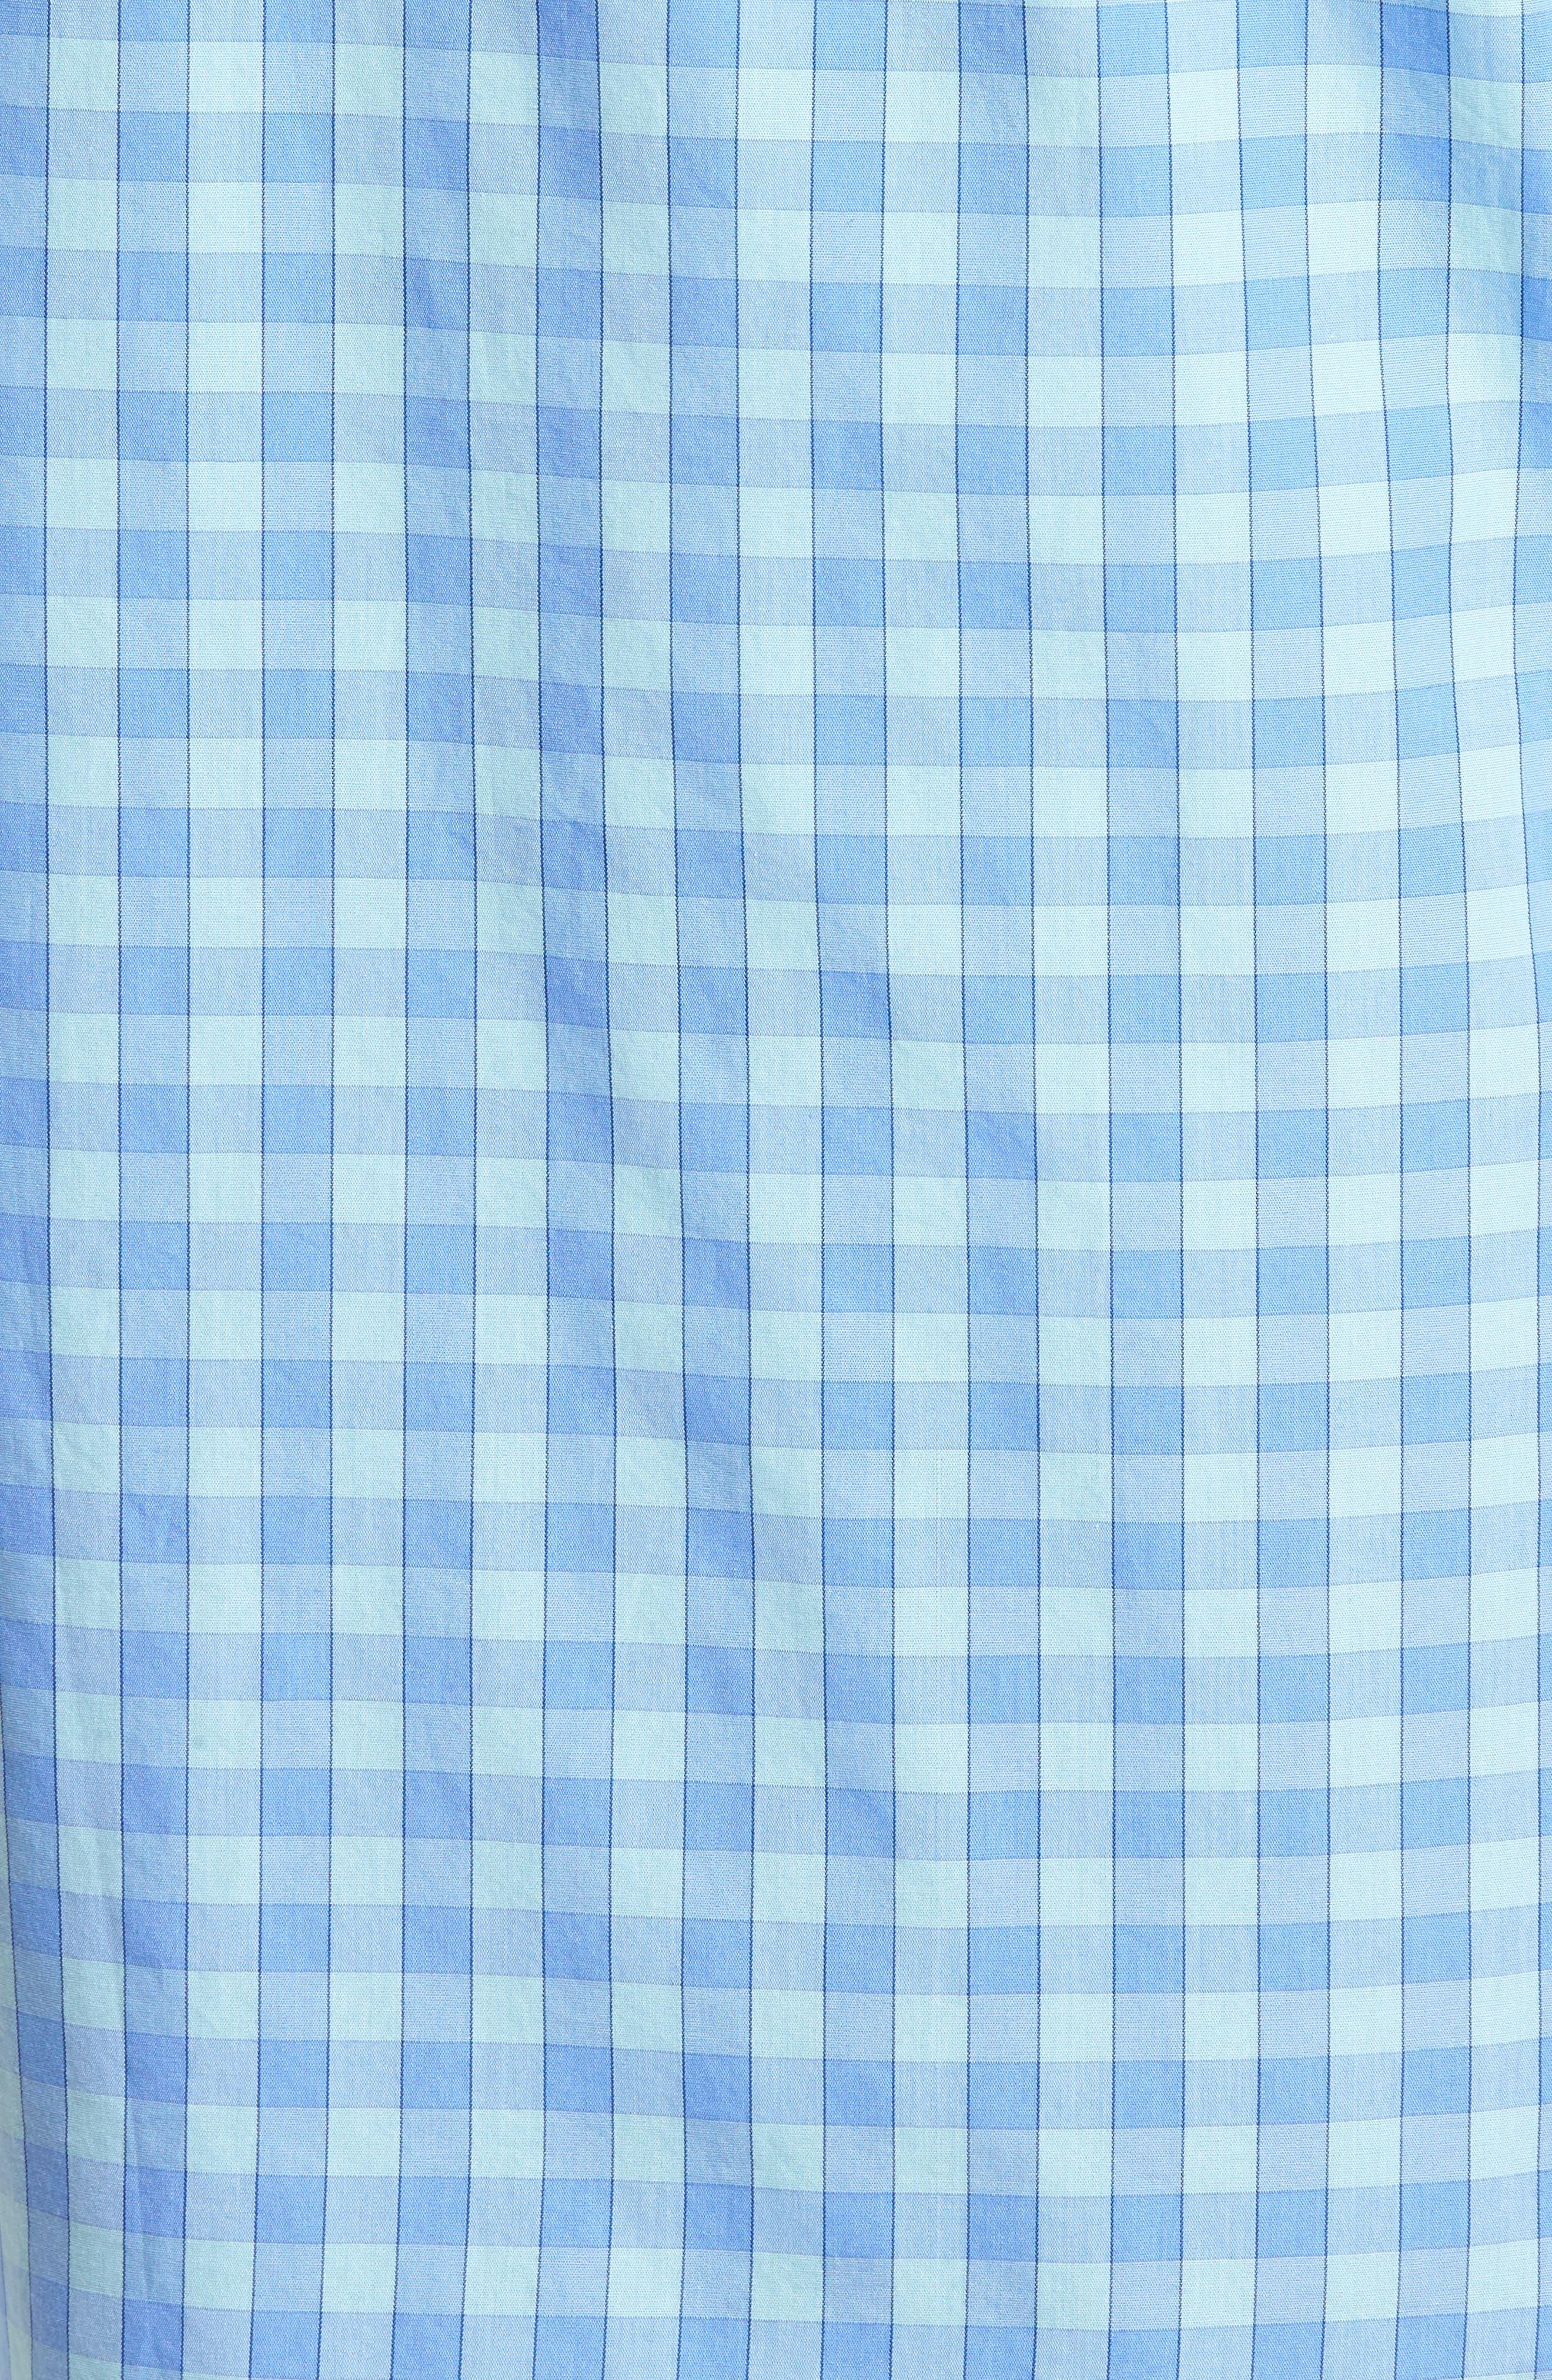 Unbutton Down 2.0 Slim Fit Gingham Sport Shirt,                             Alternate thumbnail 5, color,                             Sail Boat Gingham/ Island